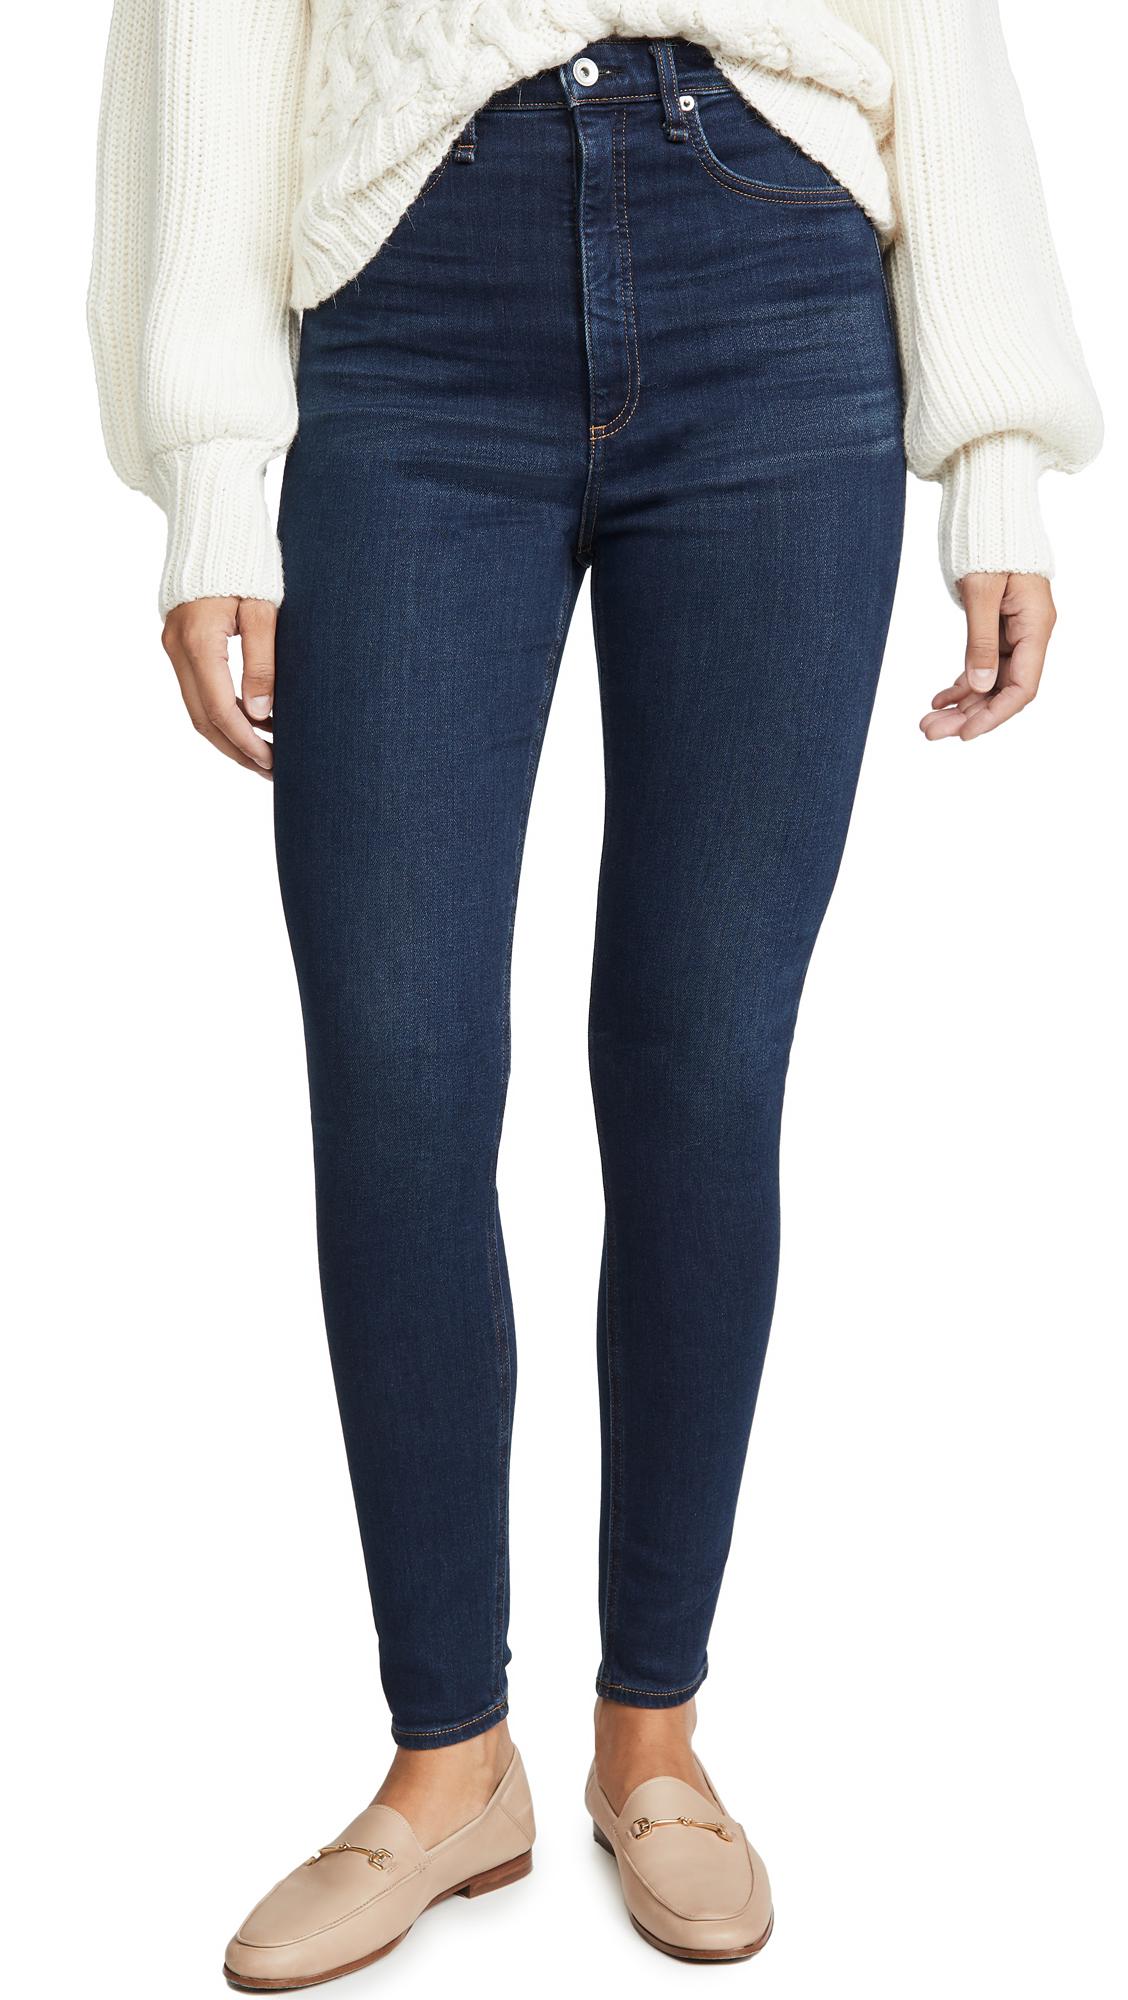 Buy Rag & Bone/JEAN online - photo of Rag & Bone/JEAN Jane Super High-Rise Skinny Jeans